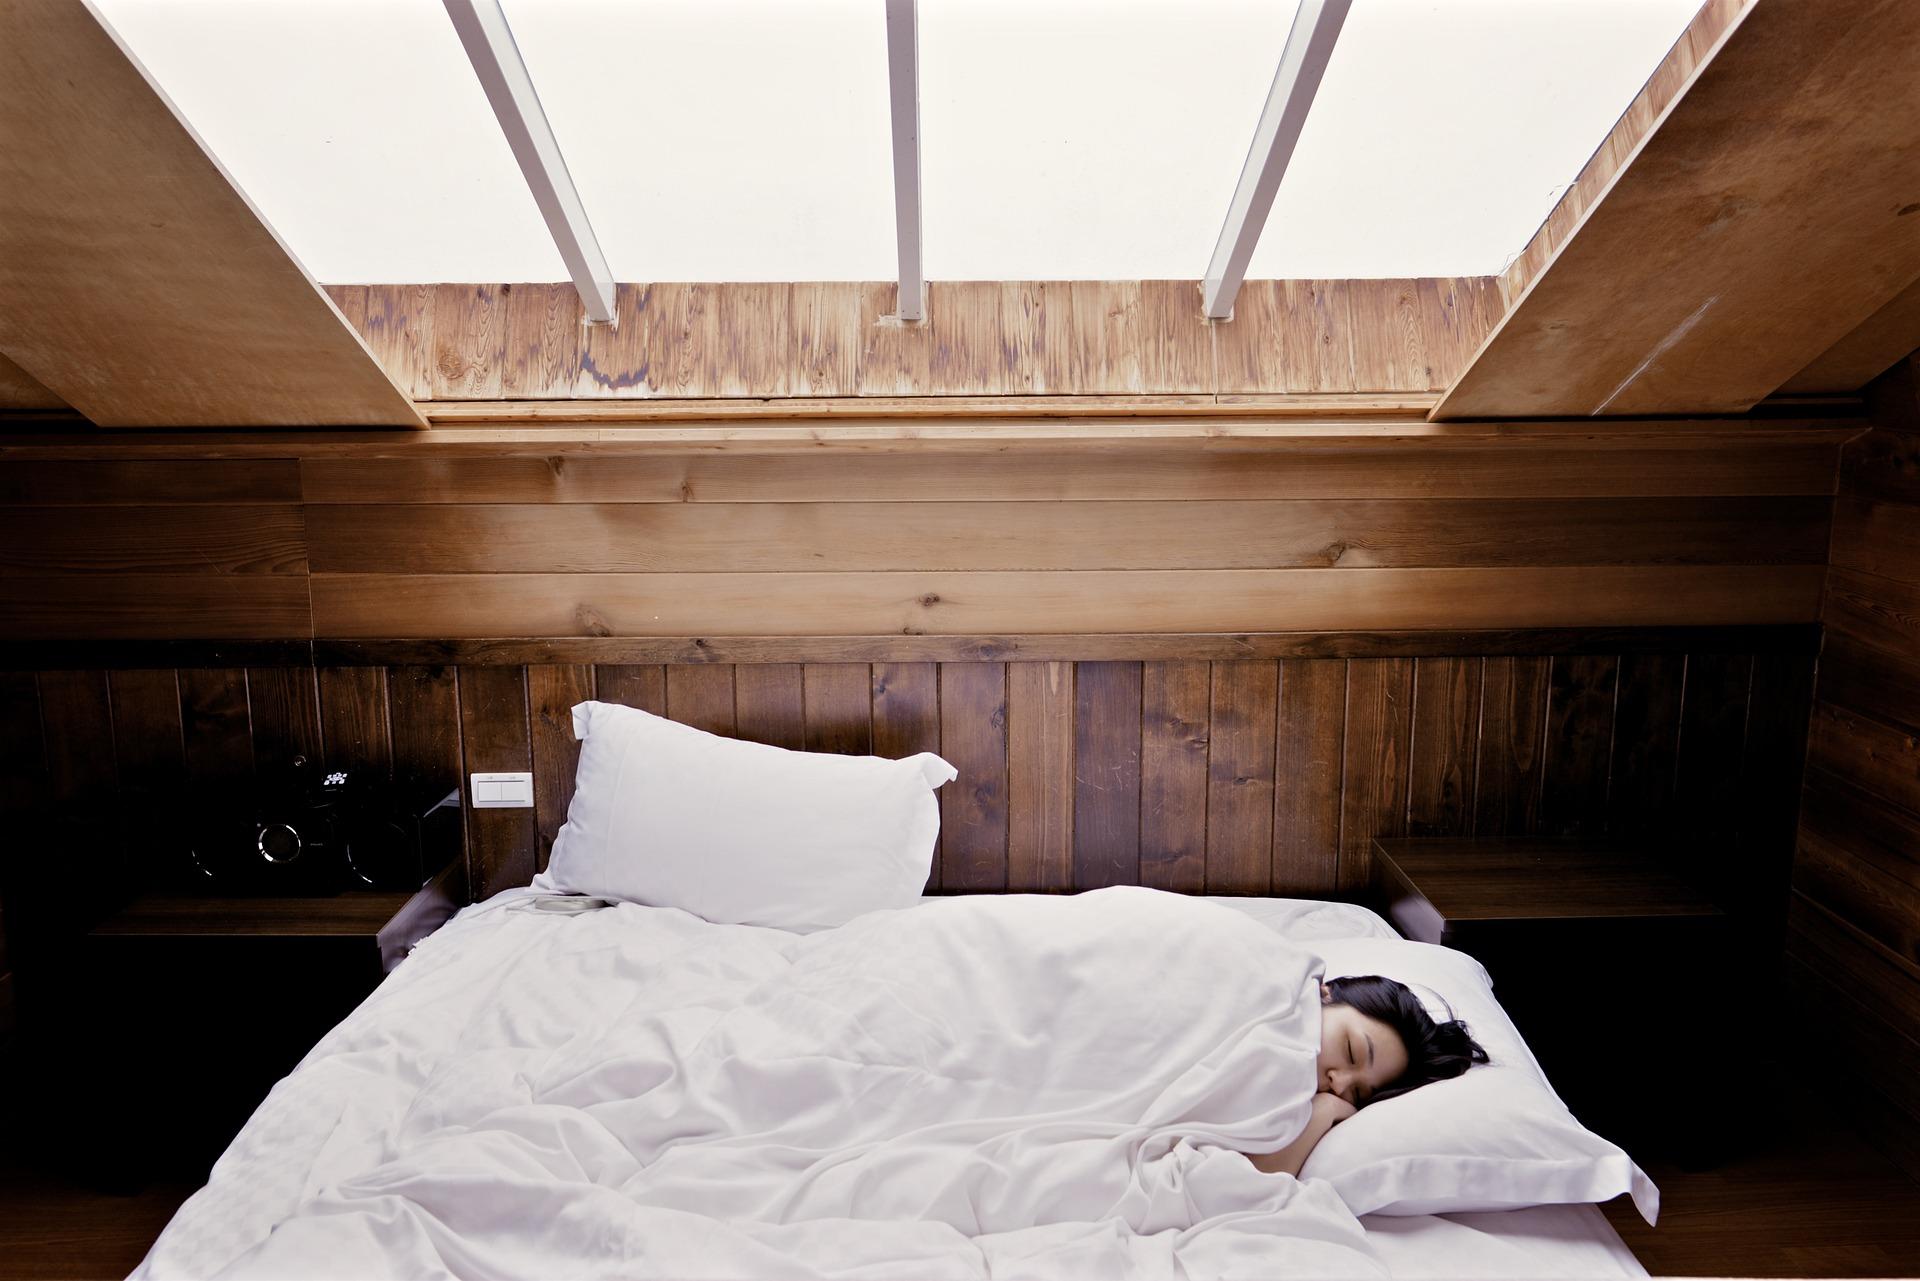 Importance of Having Good Sleep Hygiene